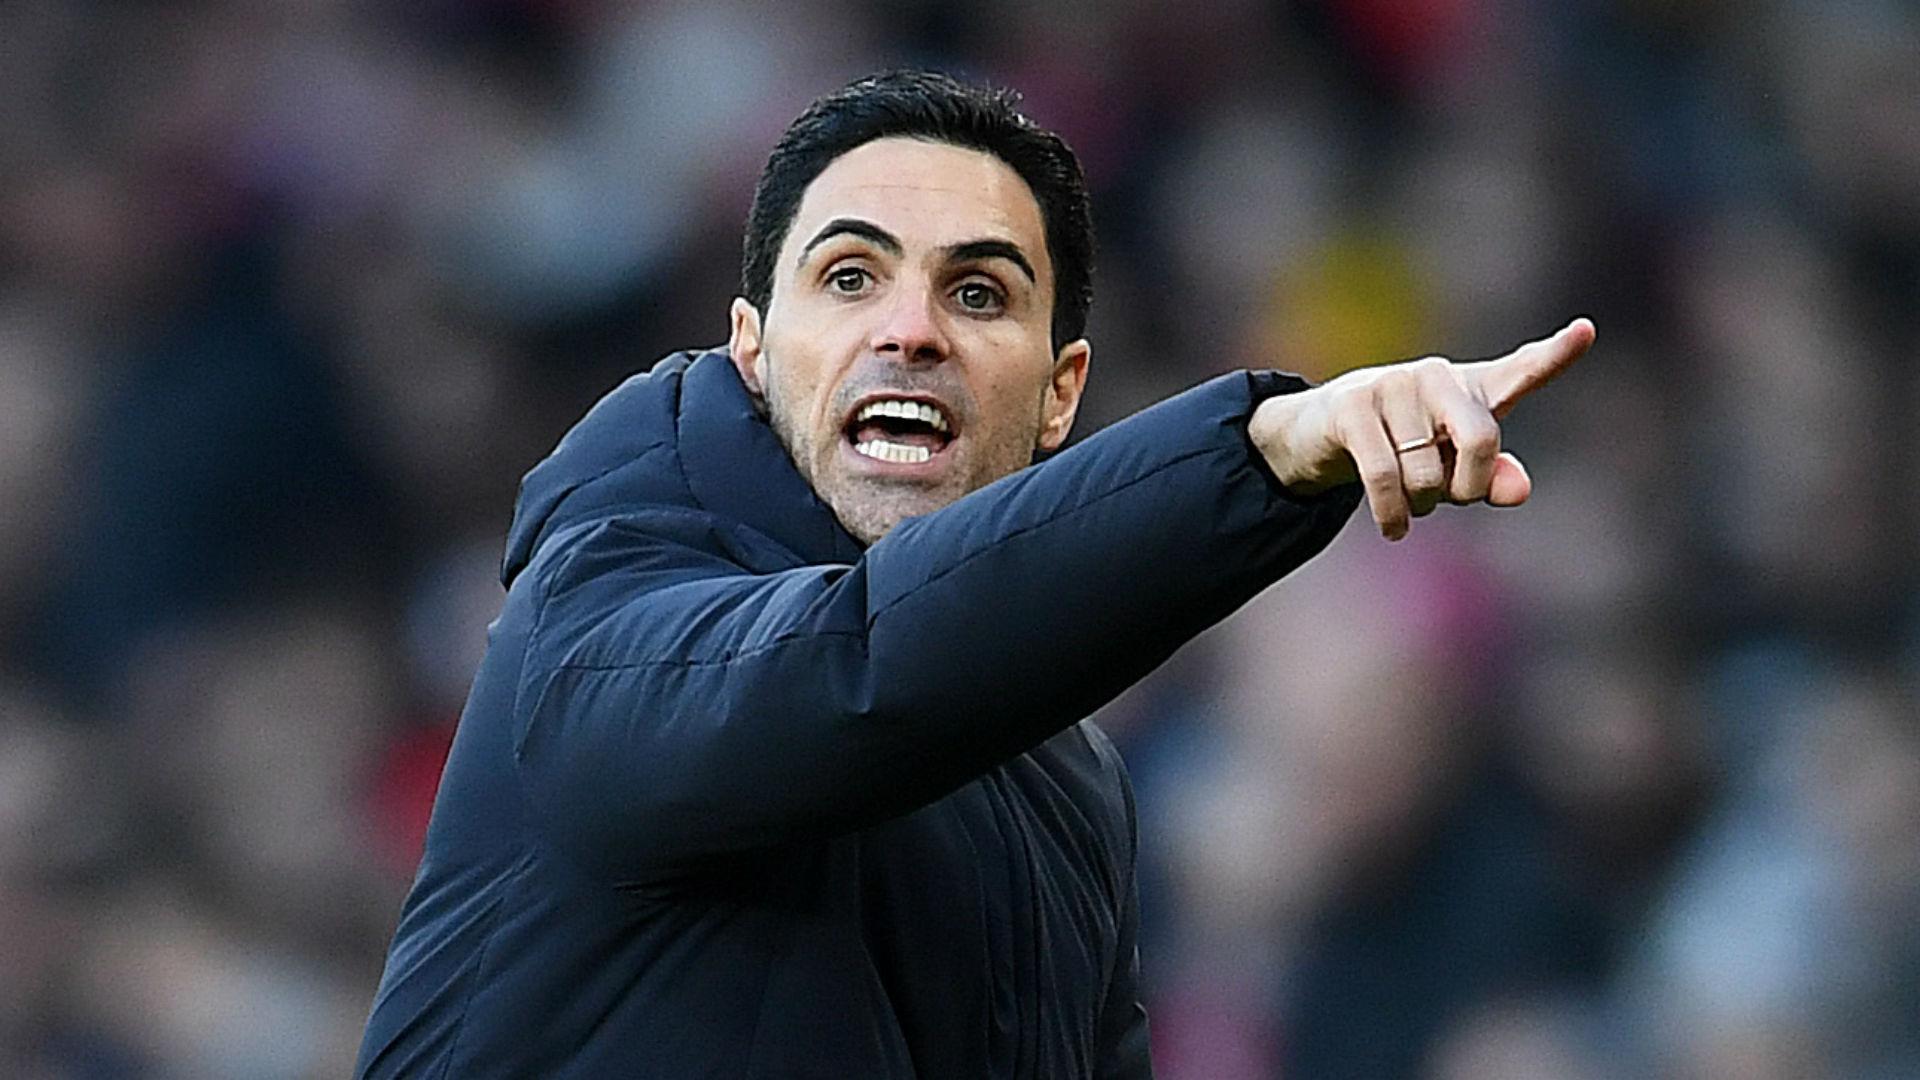 Arteta confirms Arsenal looking for reinforcements after Mustafi injury blow